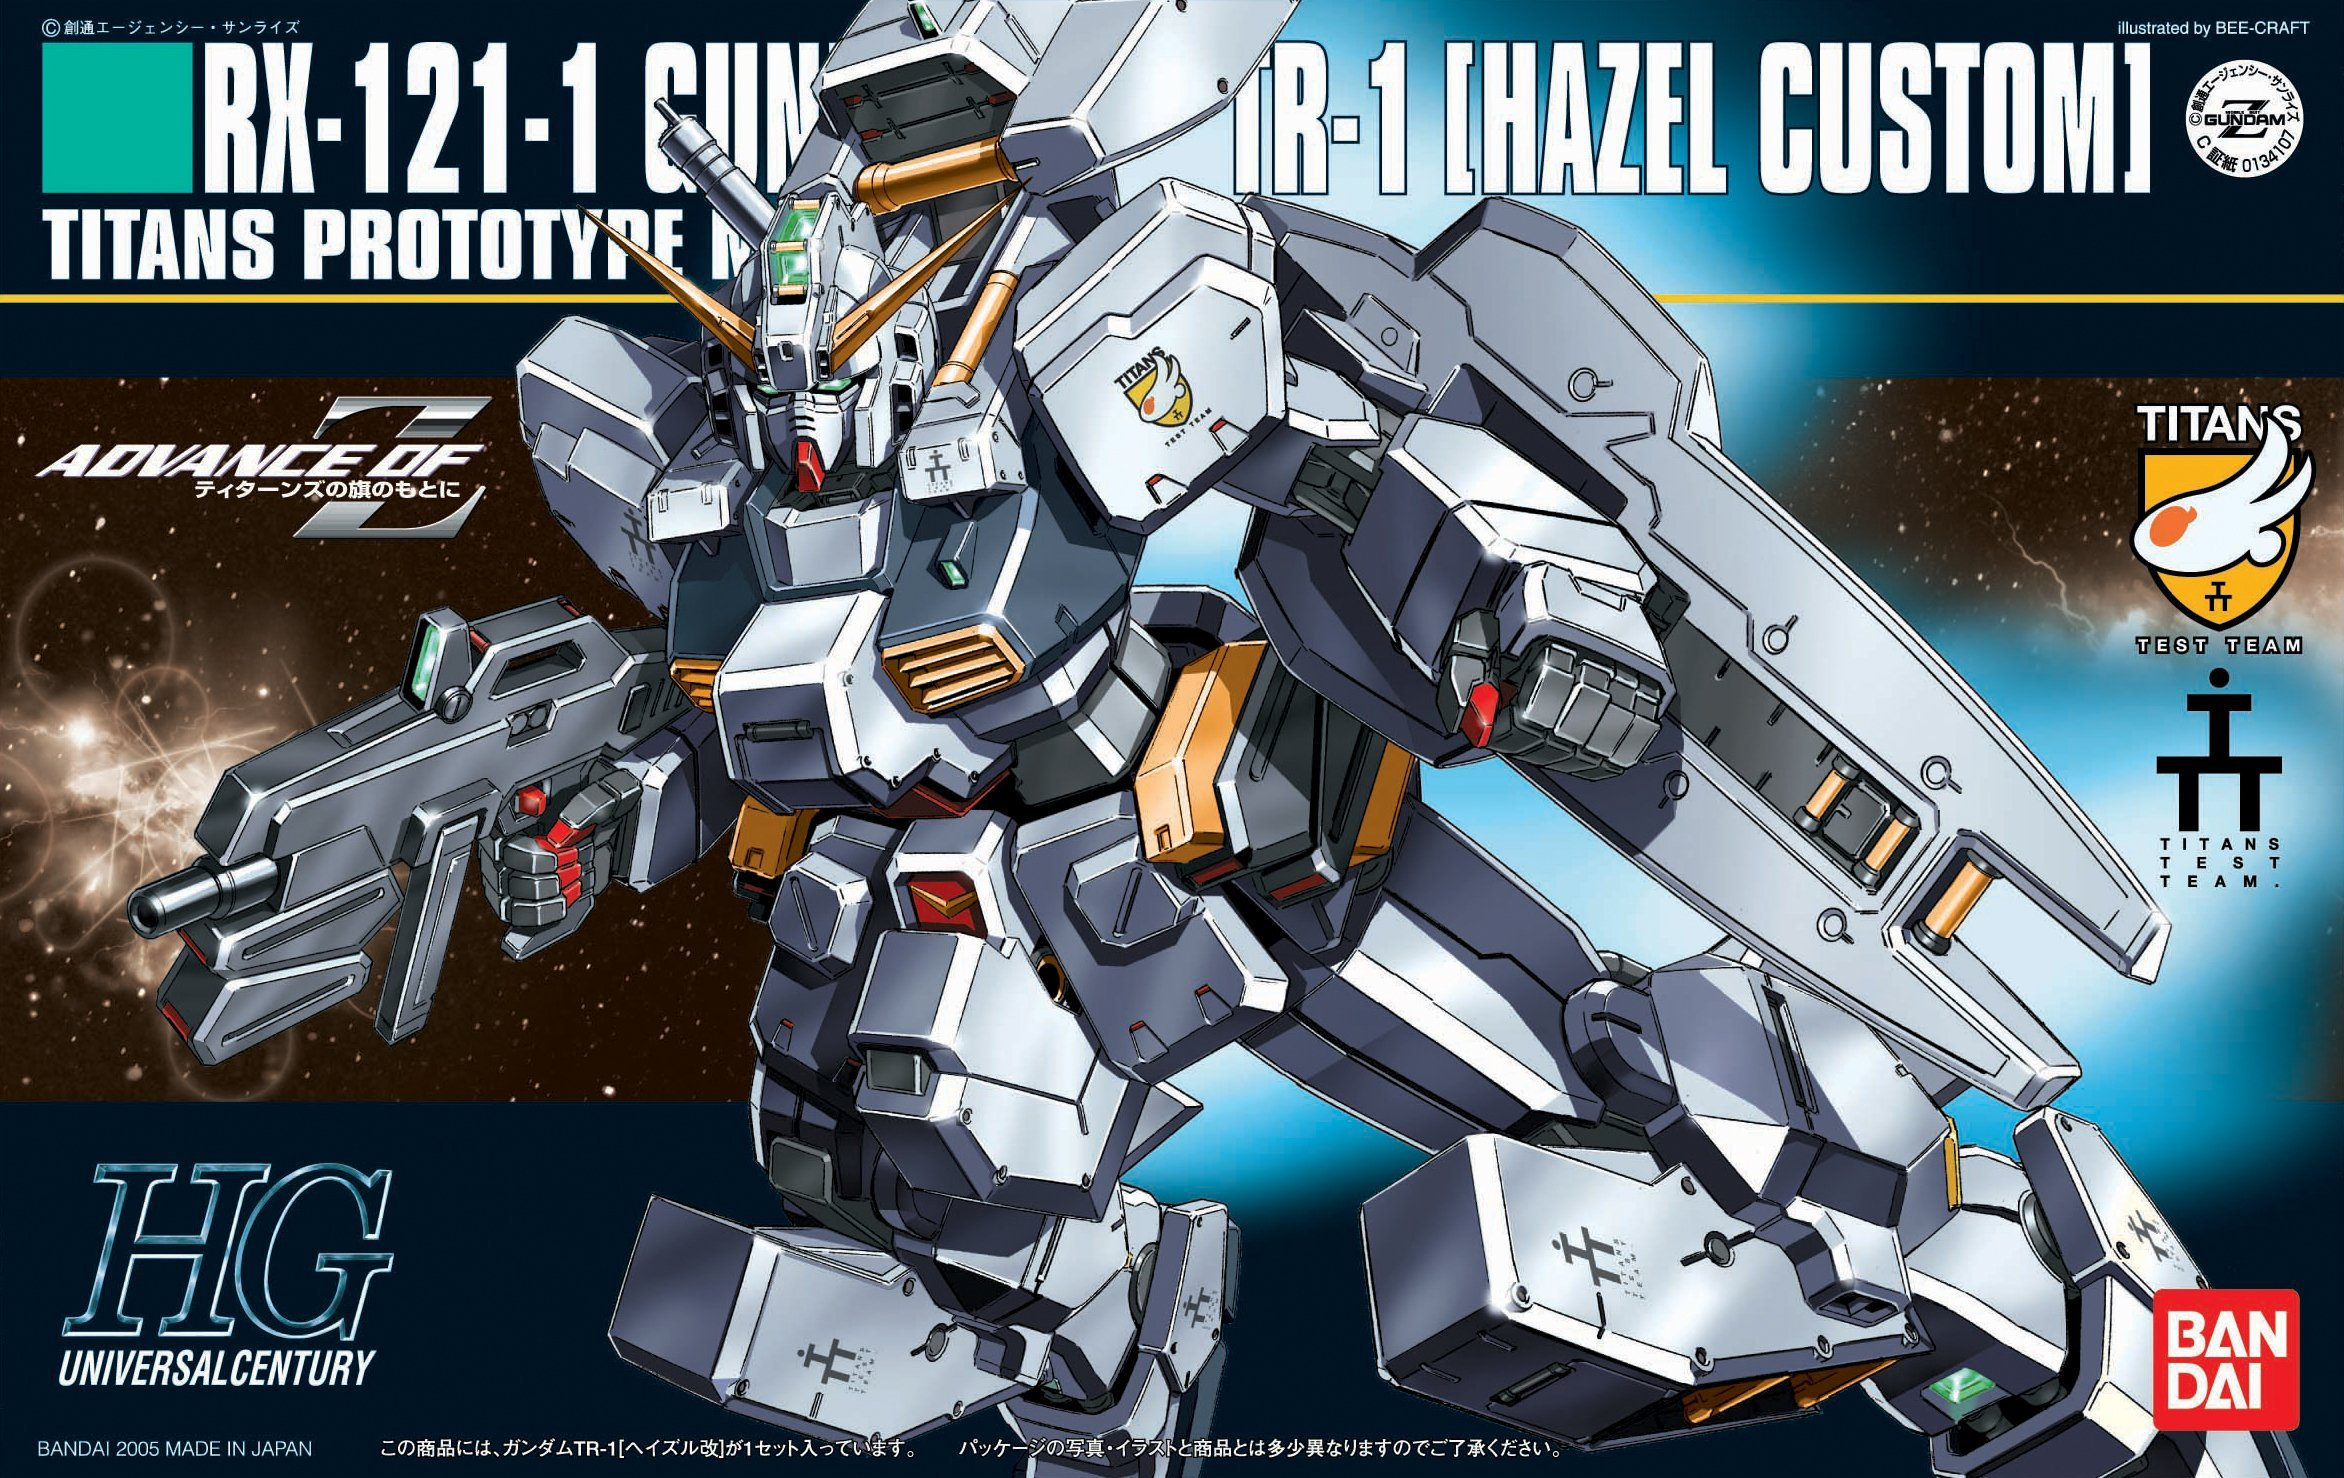 Bandai Hobby #56 RX121-1 TR-1 Hazel Custom, Bandai HGUC Action Figure by Bandai Hobby (Image #3)